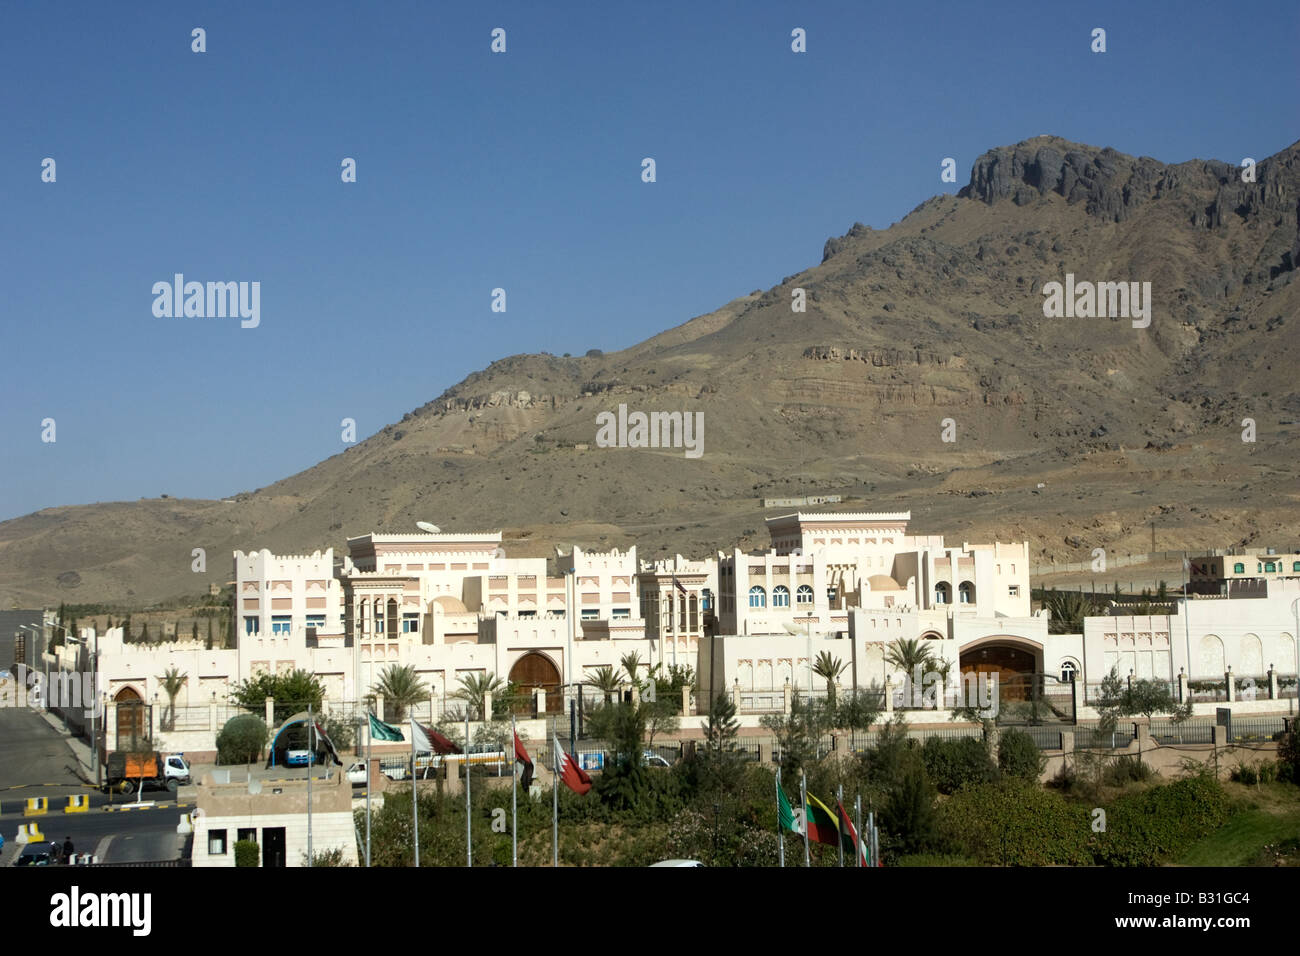 The Qatar Embassy in Sanaa Yemen Middle East - Stock Image